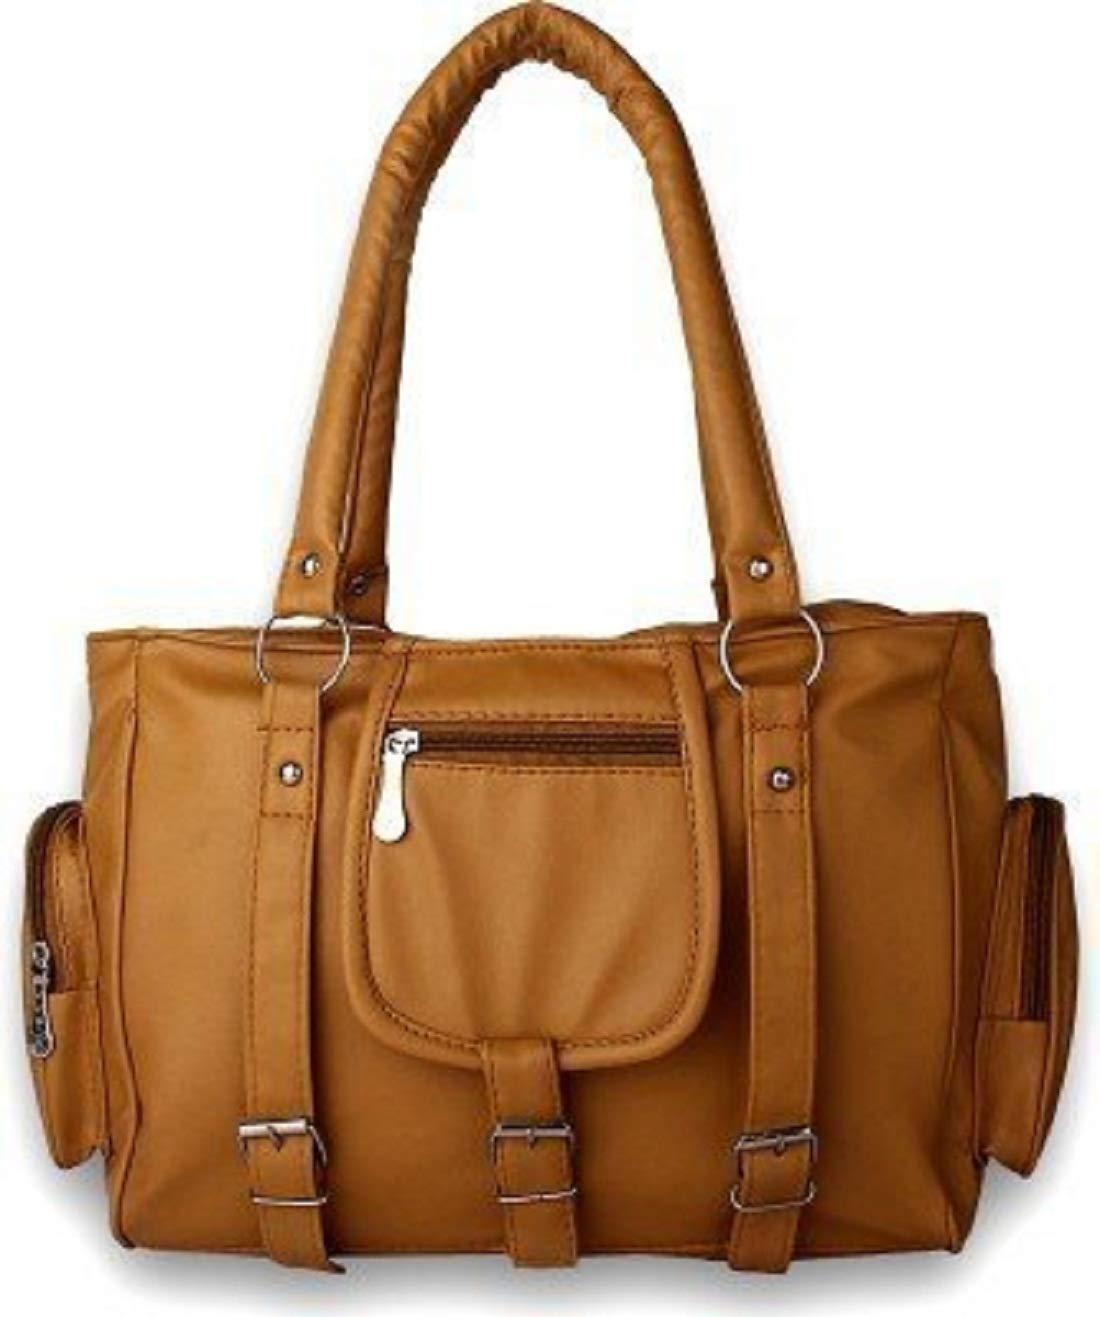 TipTon Fashion Women Handbags in Very Beautiful Tan Color with New Model I-101